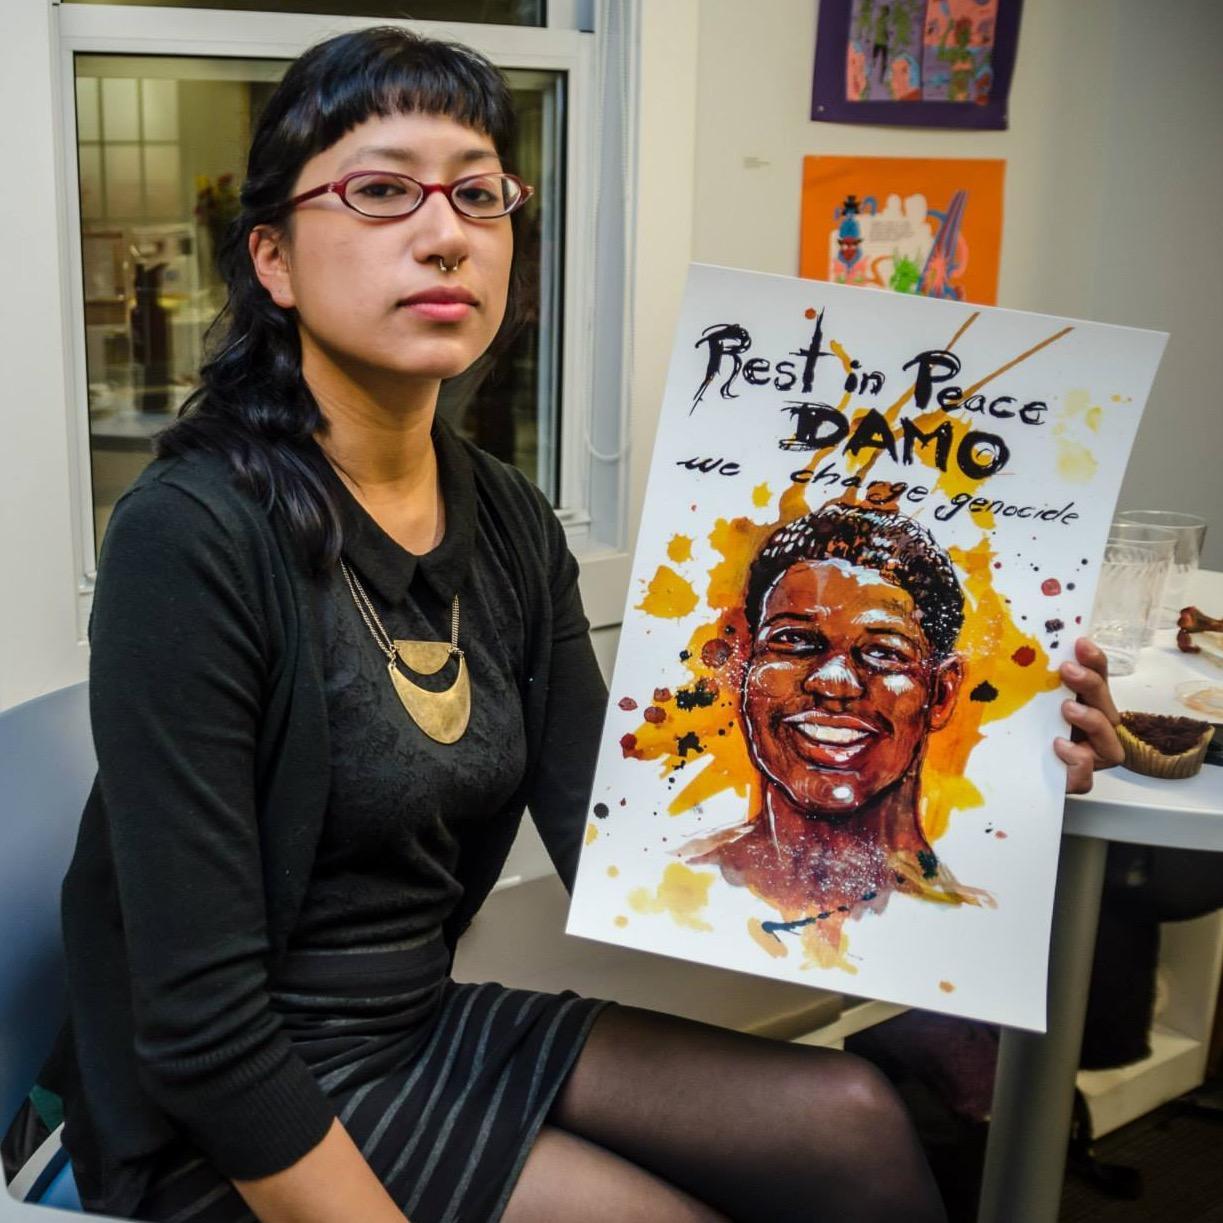 Monica Trinidad with artwork by Molly Crabapple.